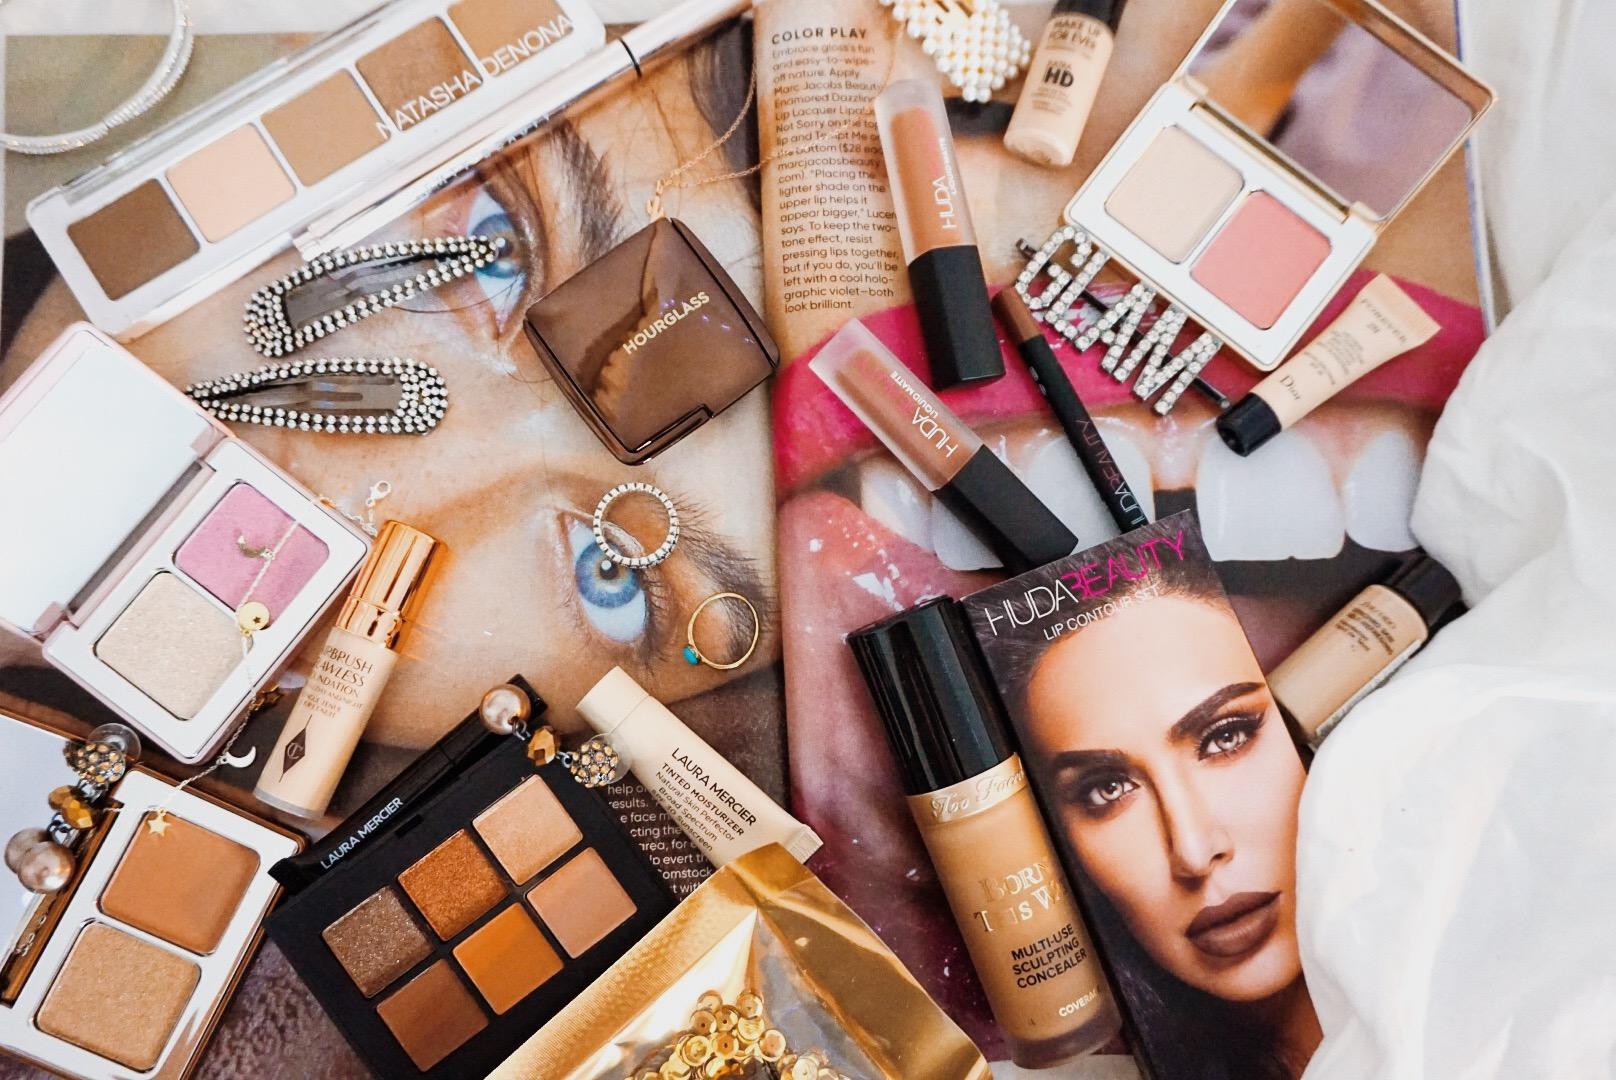 Massive Luxury Beauty Haul - Natasha Denona, Hourglass, NARS, Pat McGrath. Too Faced, Huda Beauty